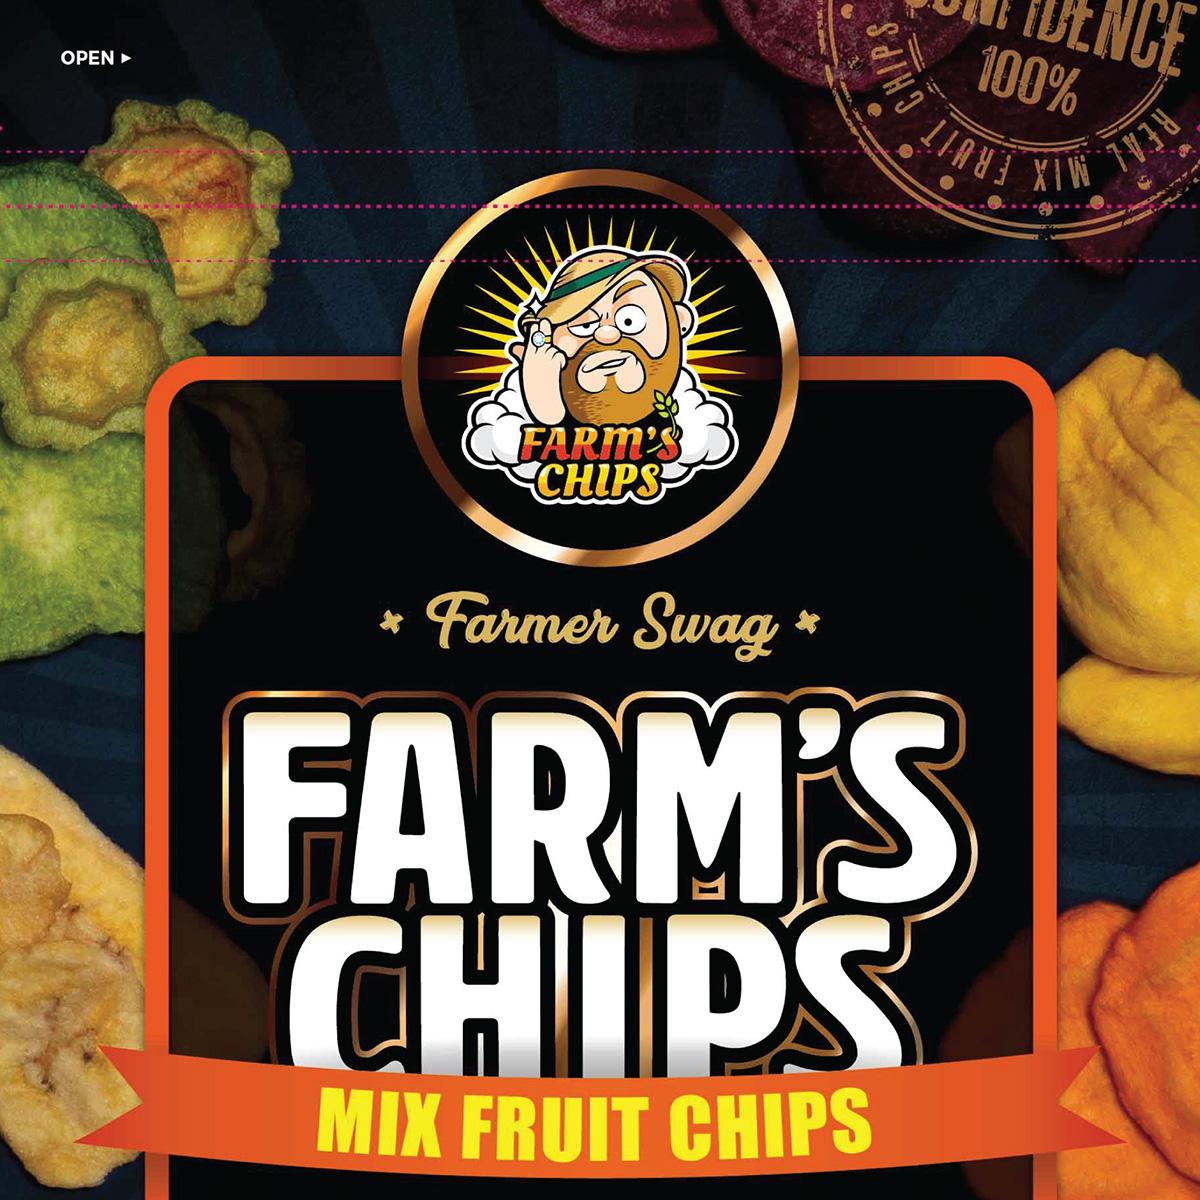 FARM'S CHIPS